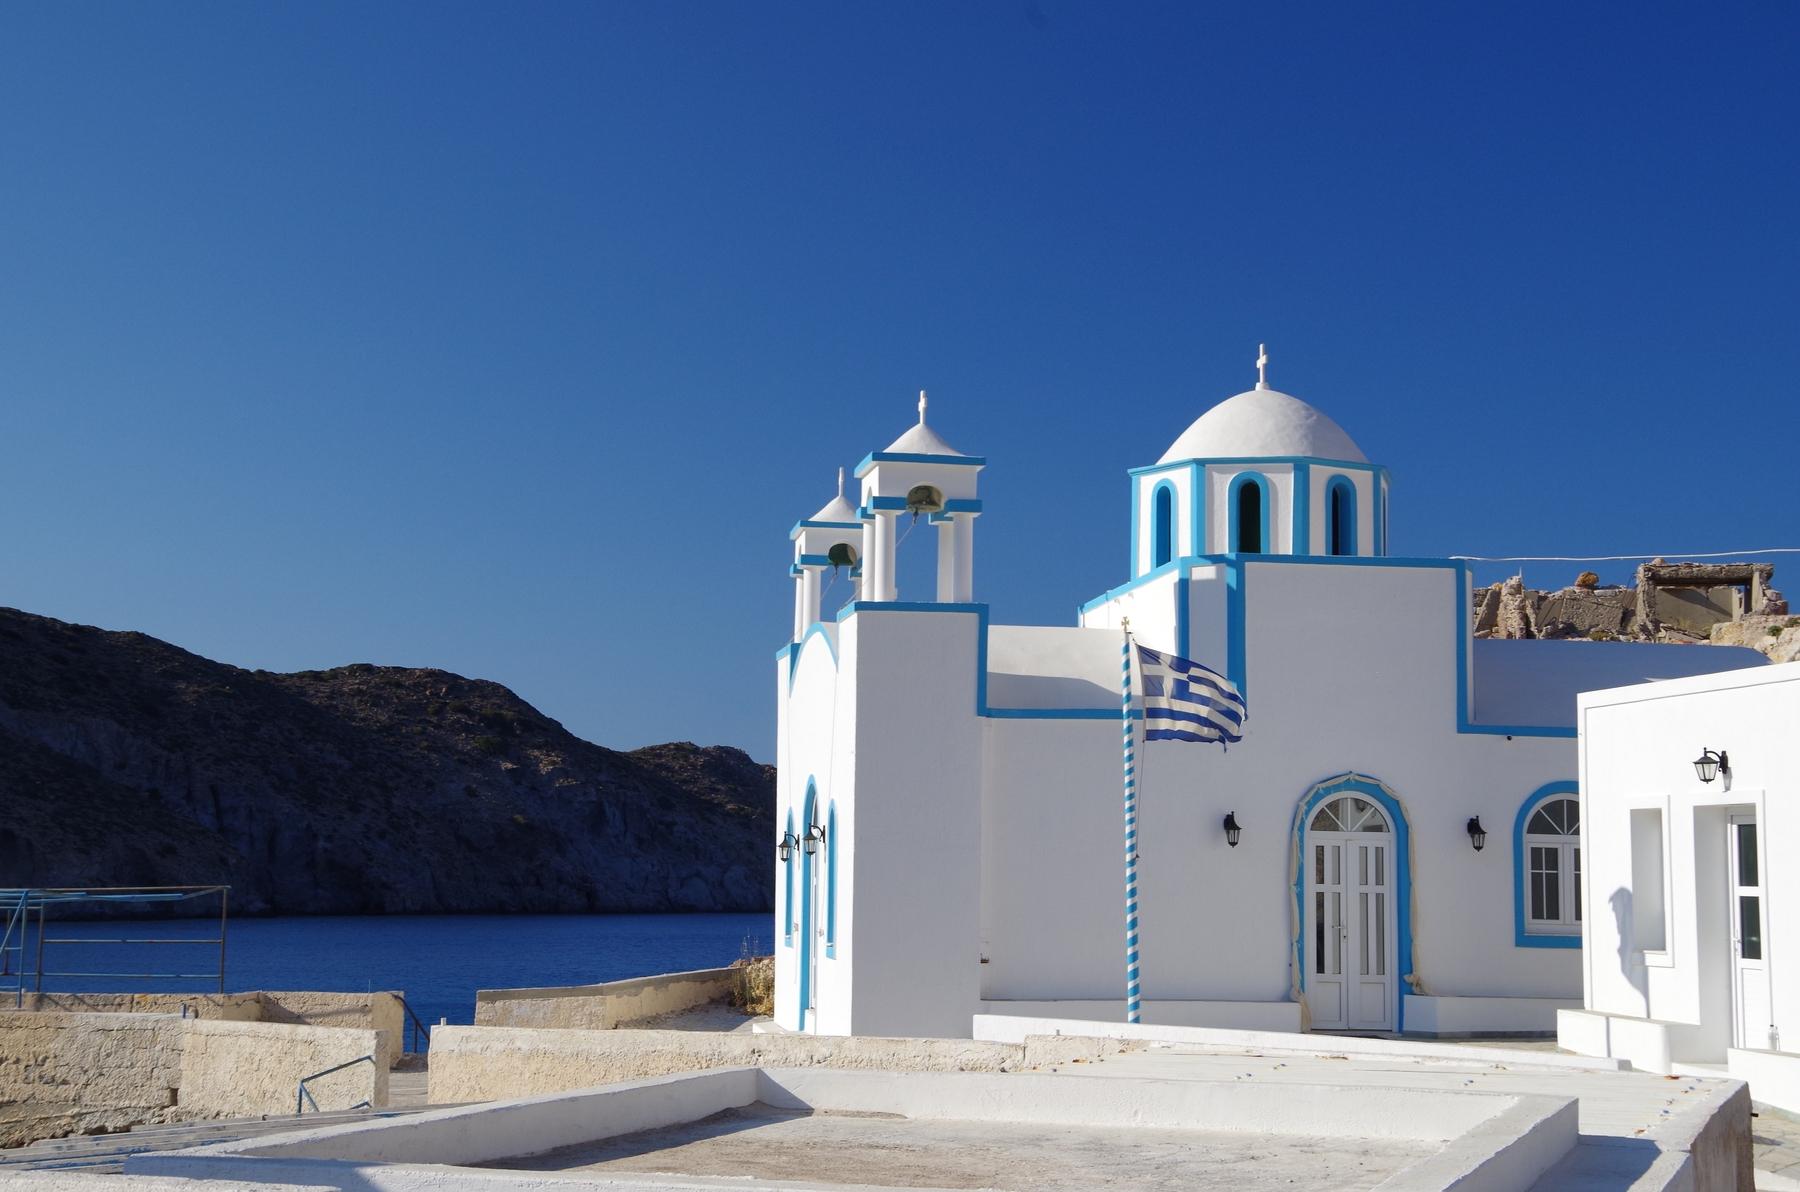 House by the sea on the island of Milos, Greece